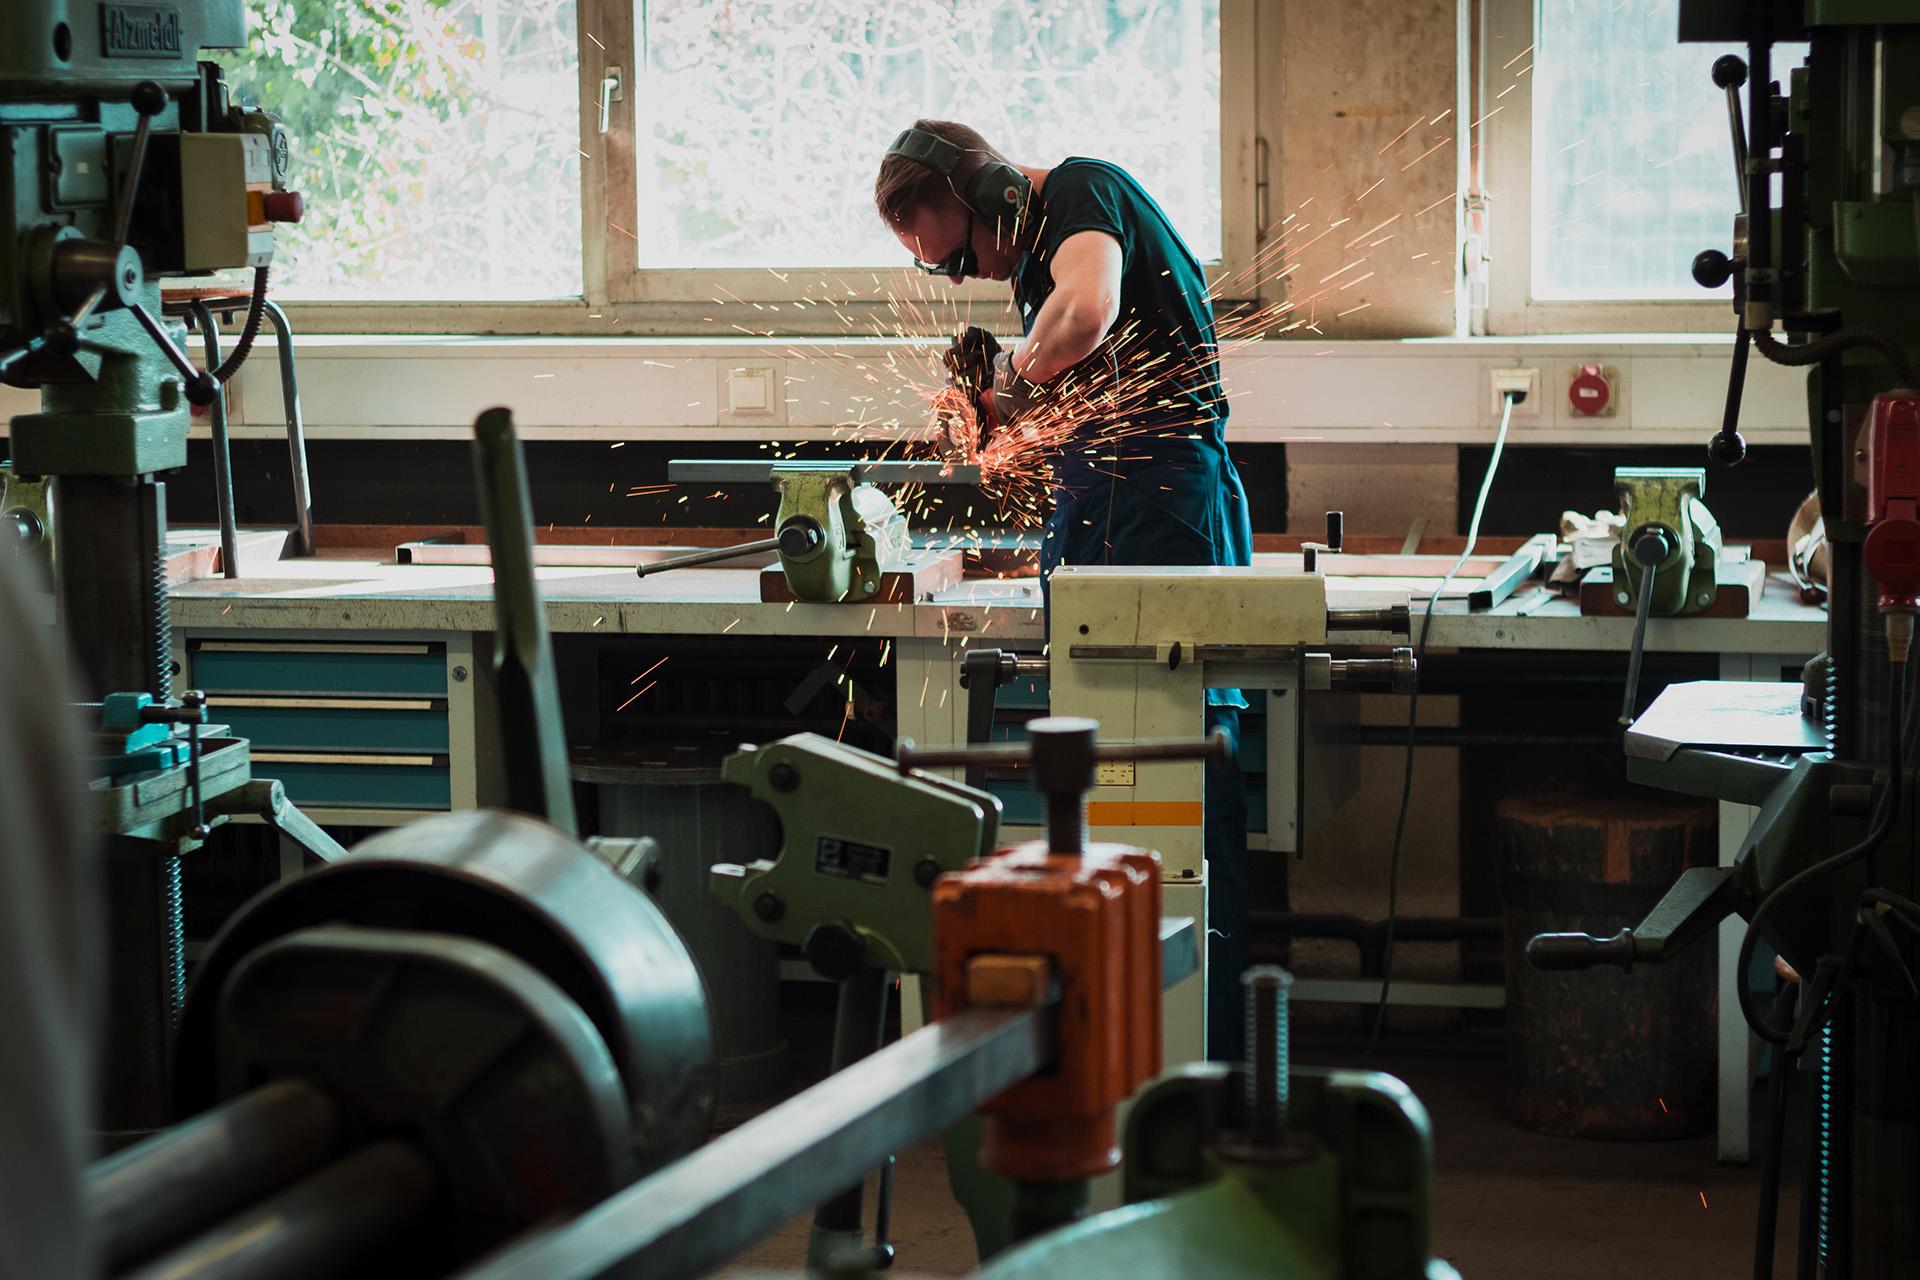 Angle grinder being used in workshop